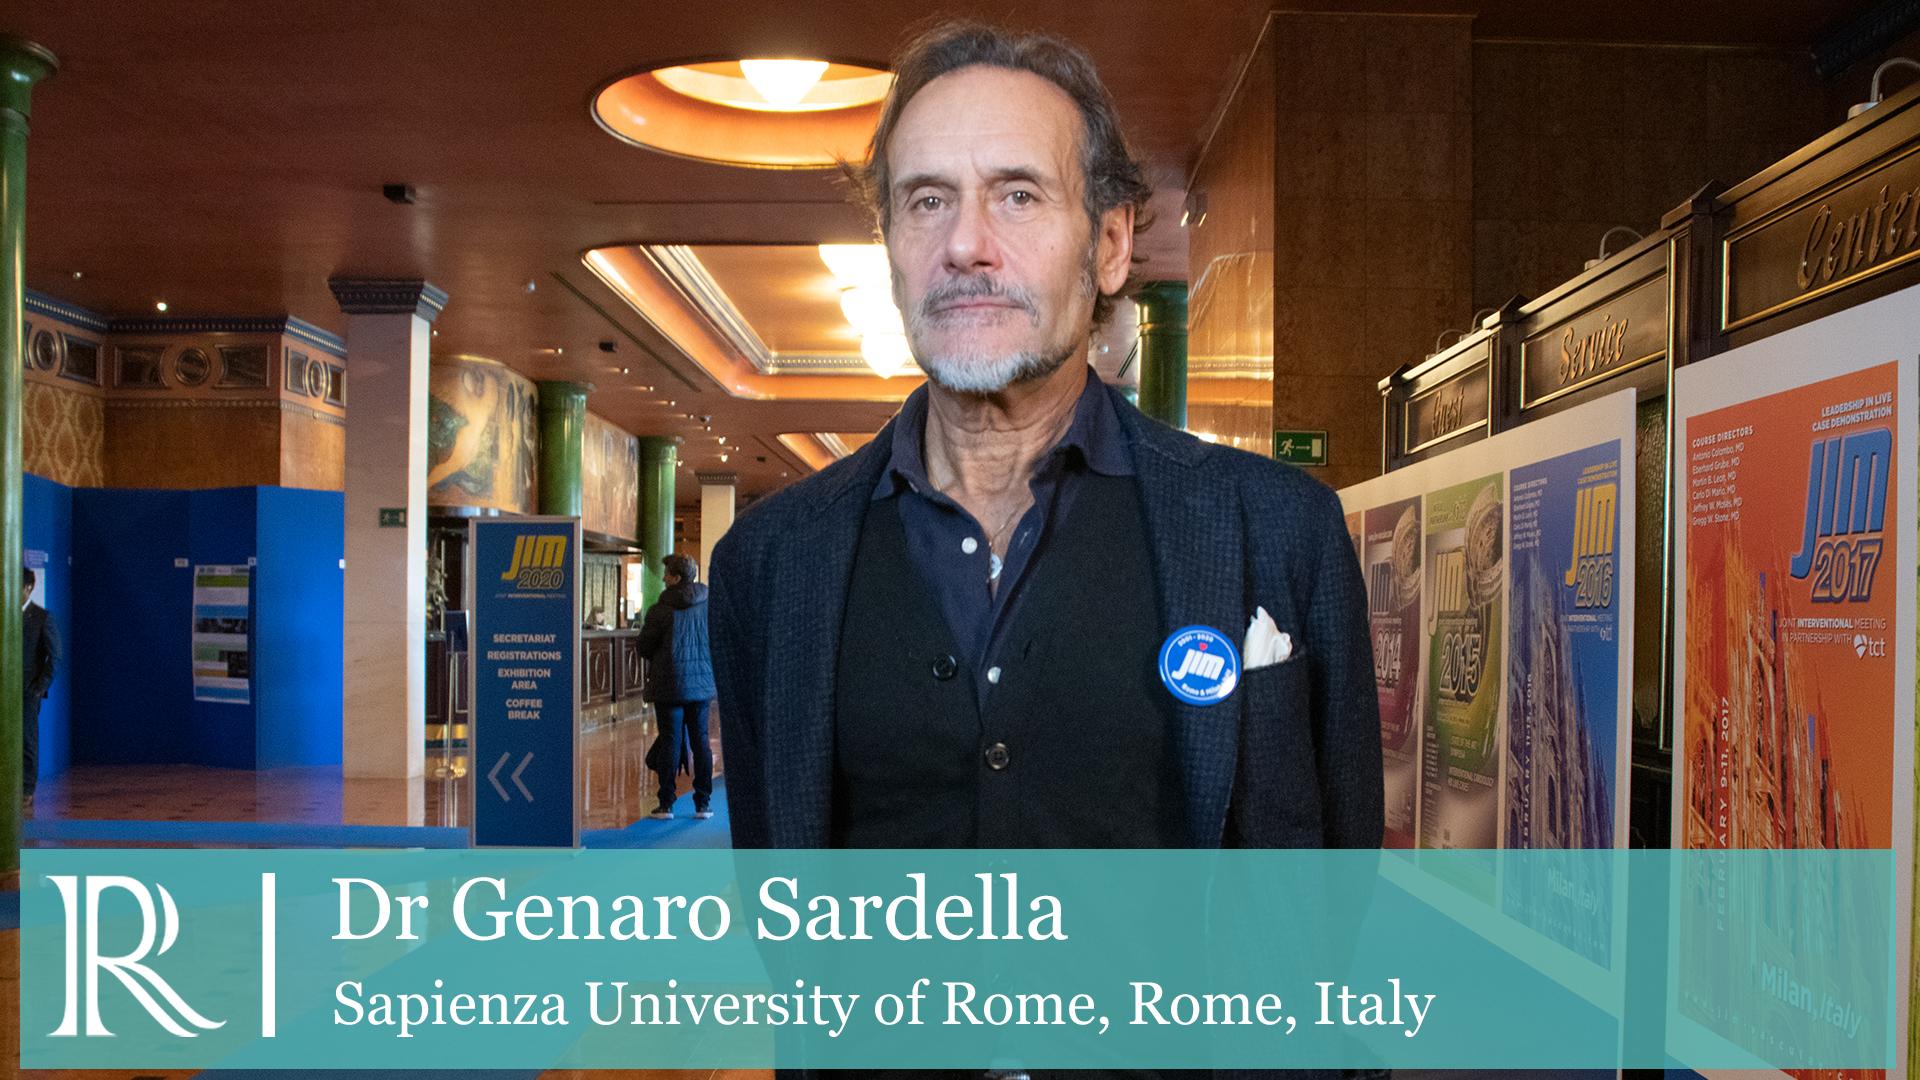 JIM 2020: Onyx ONE study — Dr Gennaro Sardella